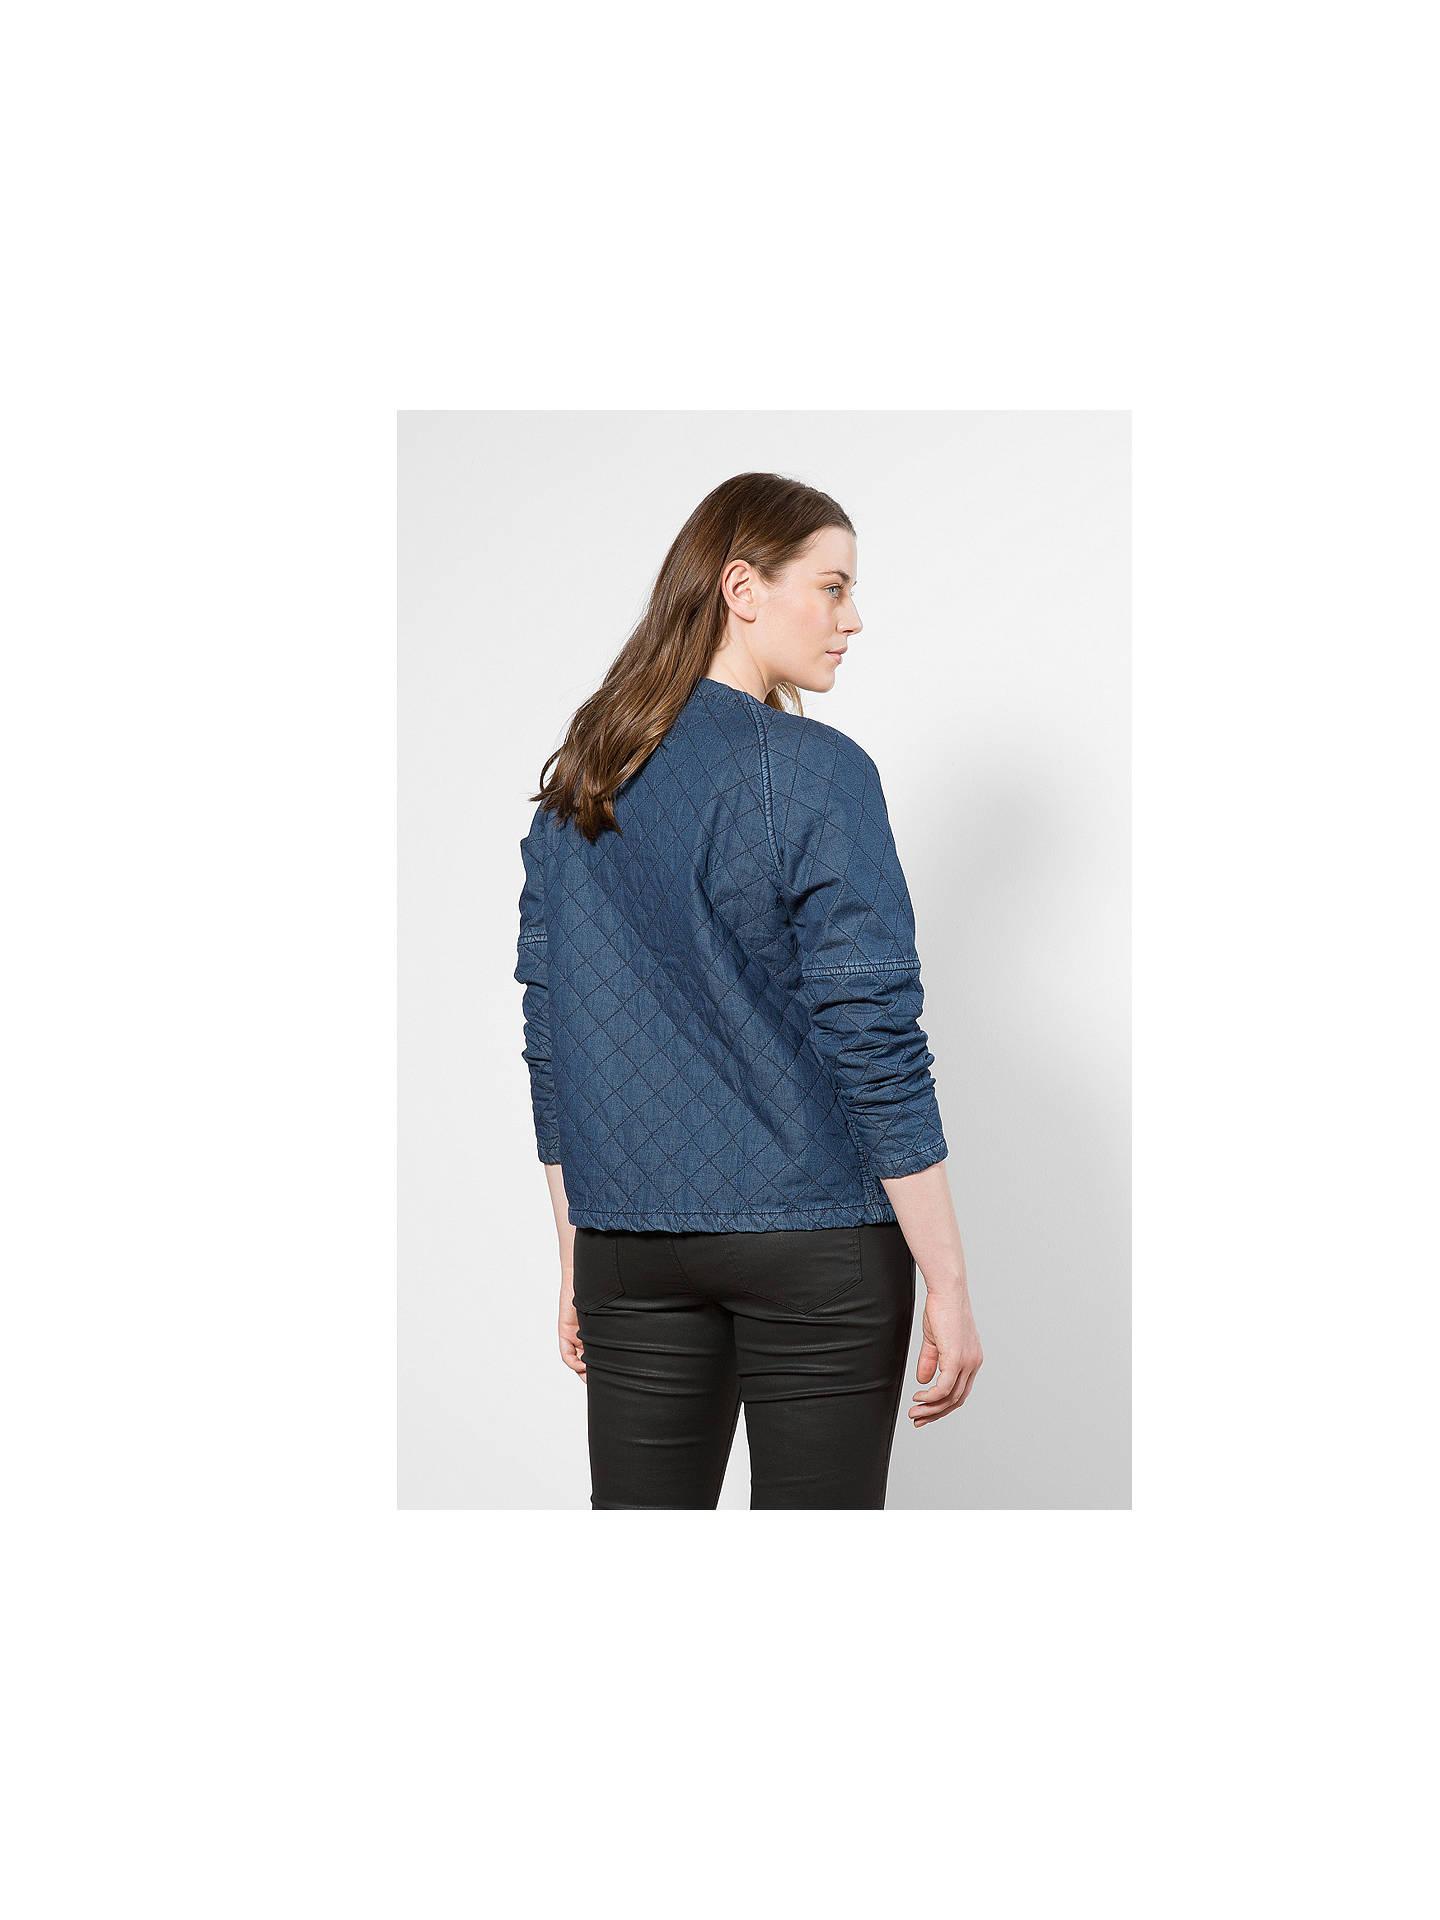 200204cee05 ... Buy Violeta by Mango Quilted Denim Jacket